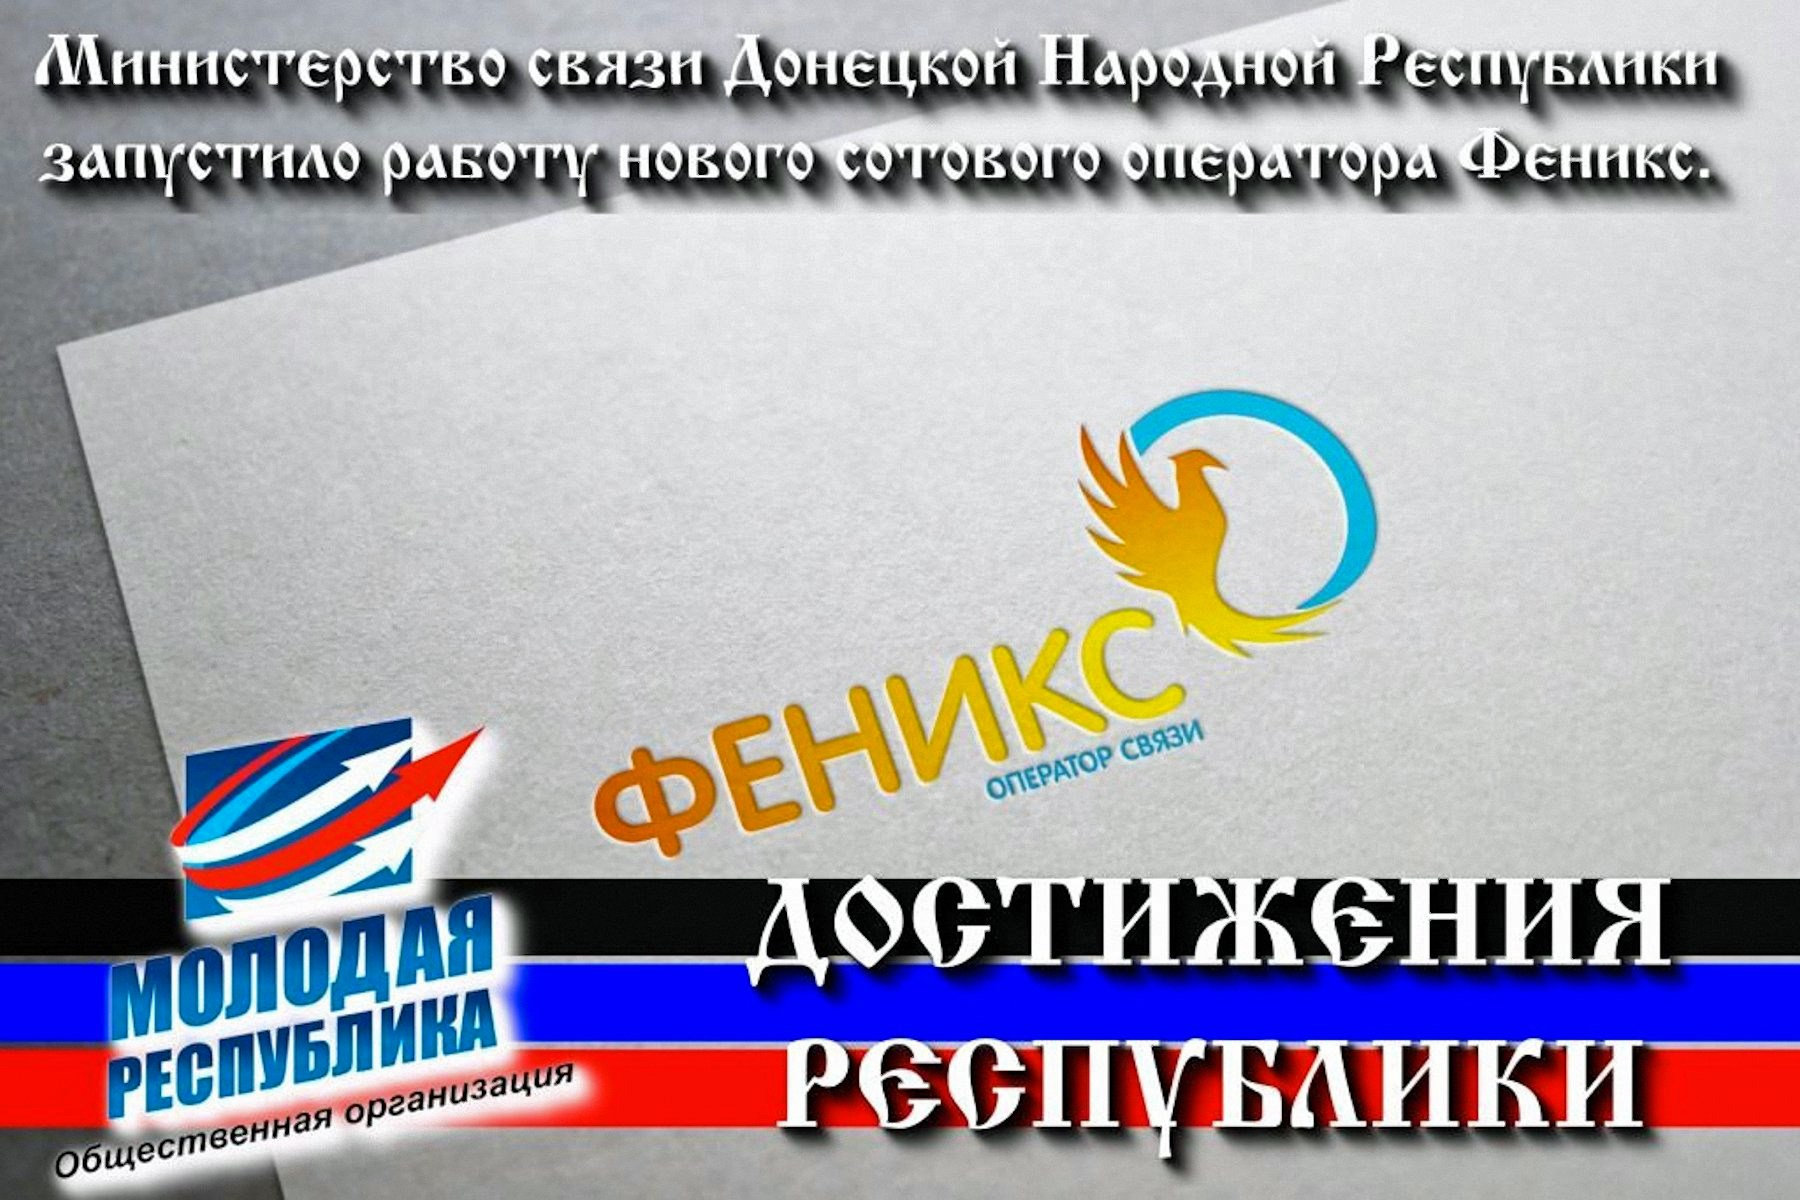 00 property of the republic dnr donetsk pr 01 280815